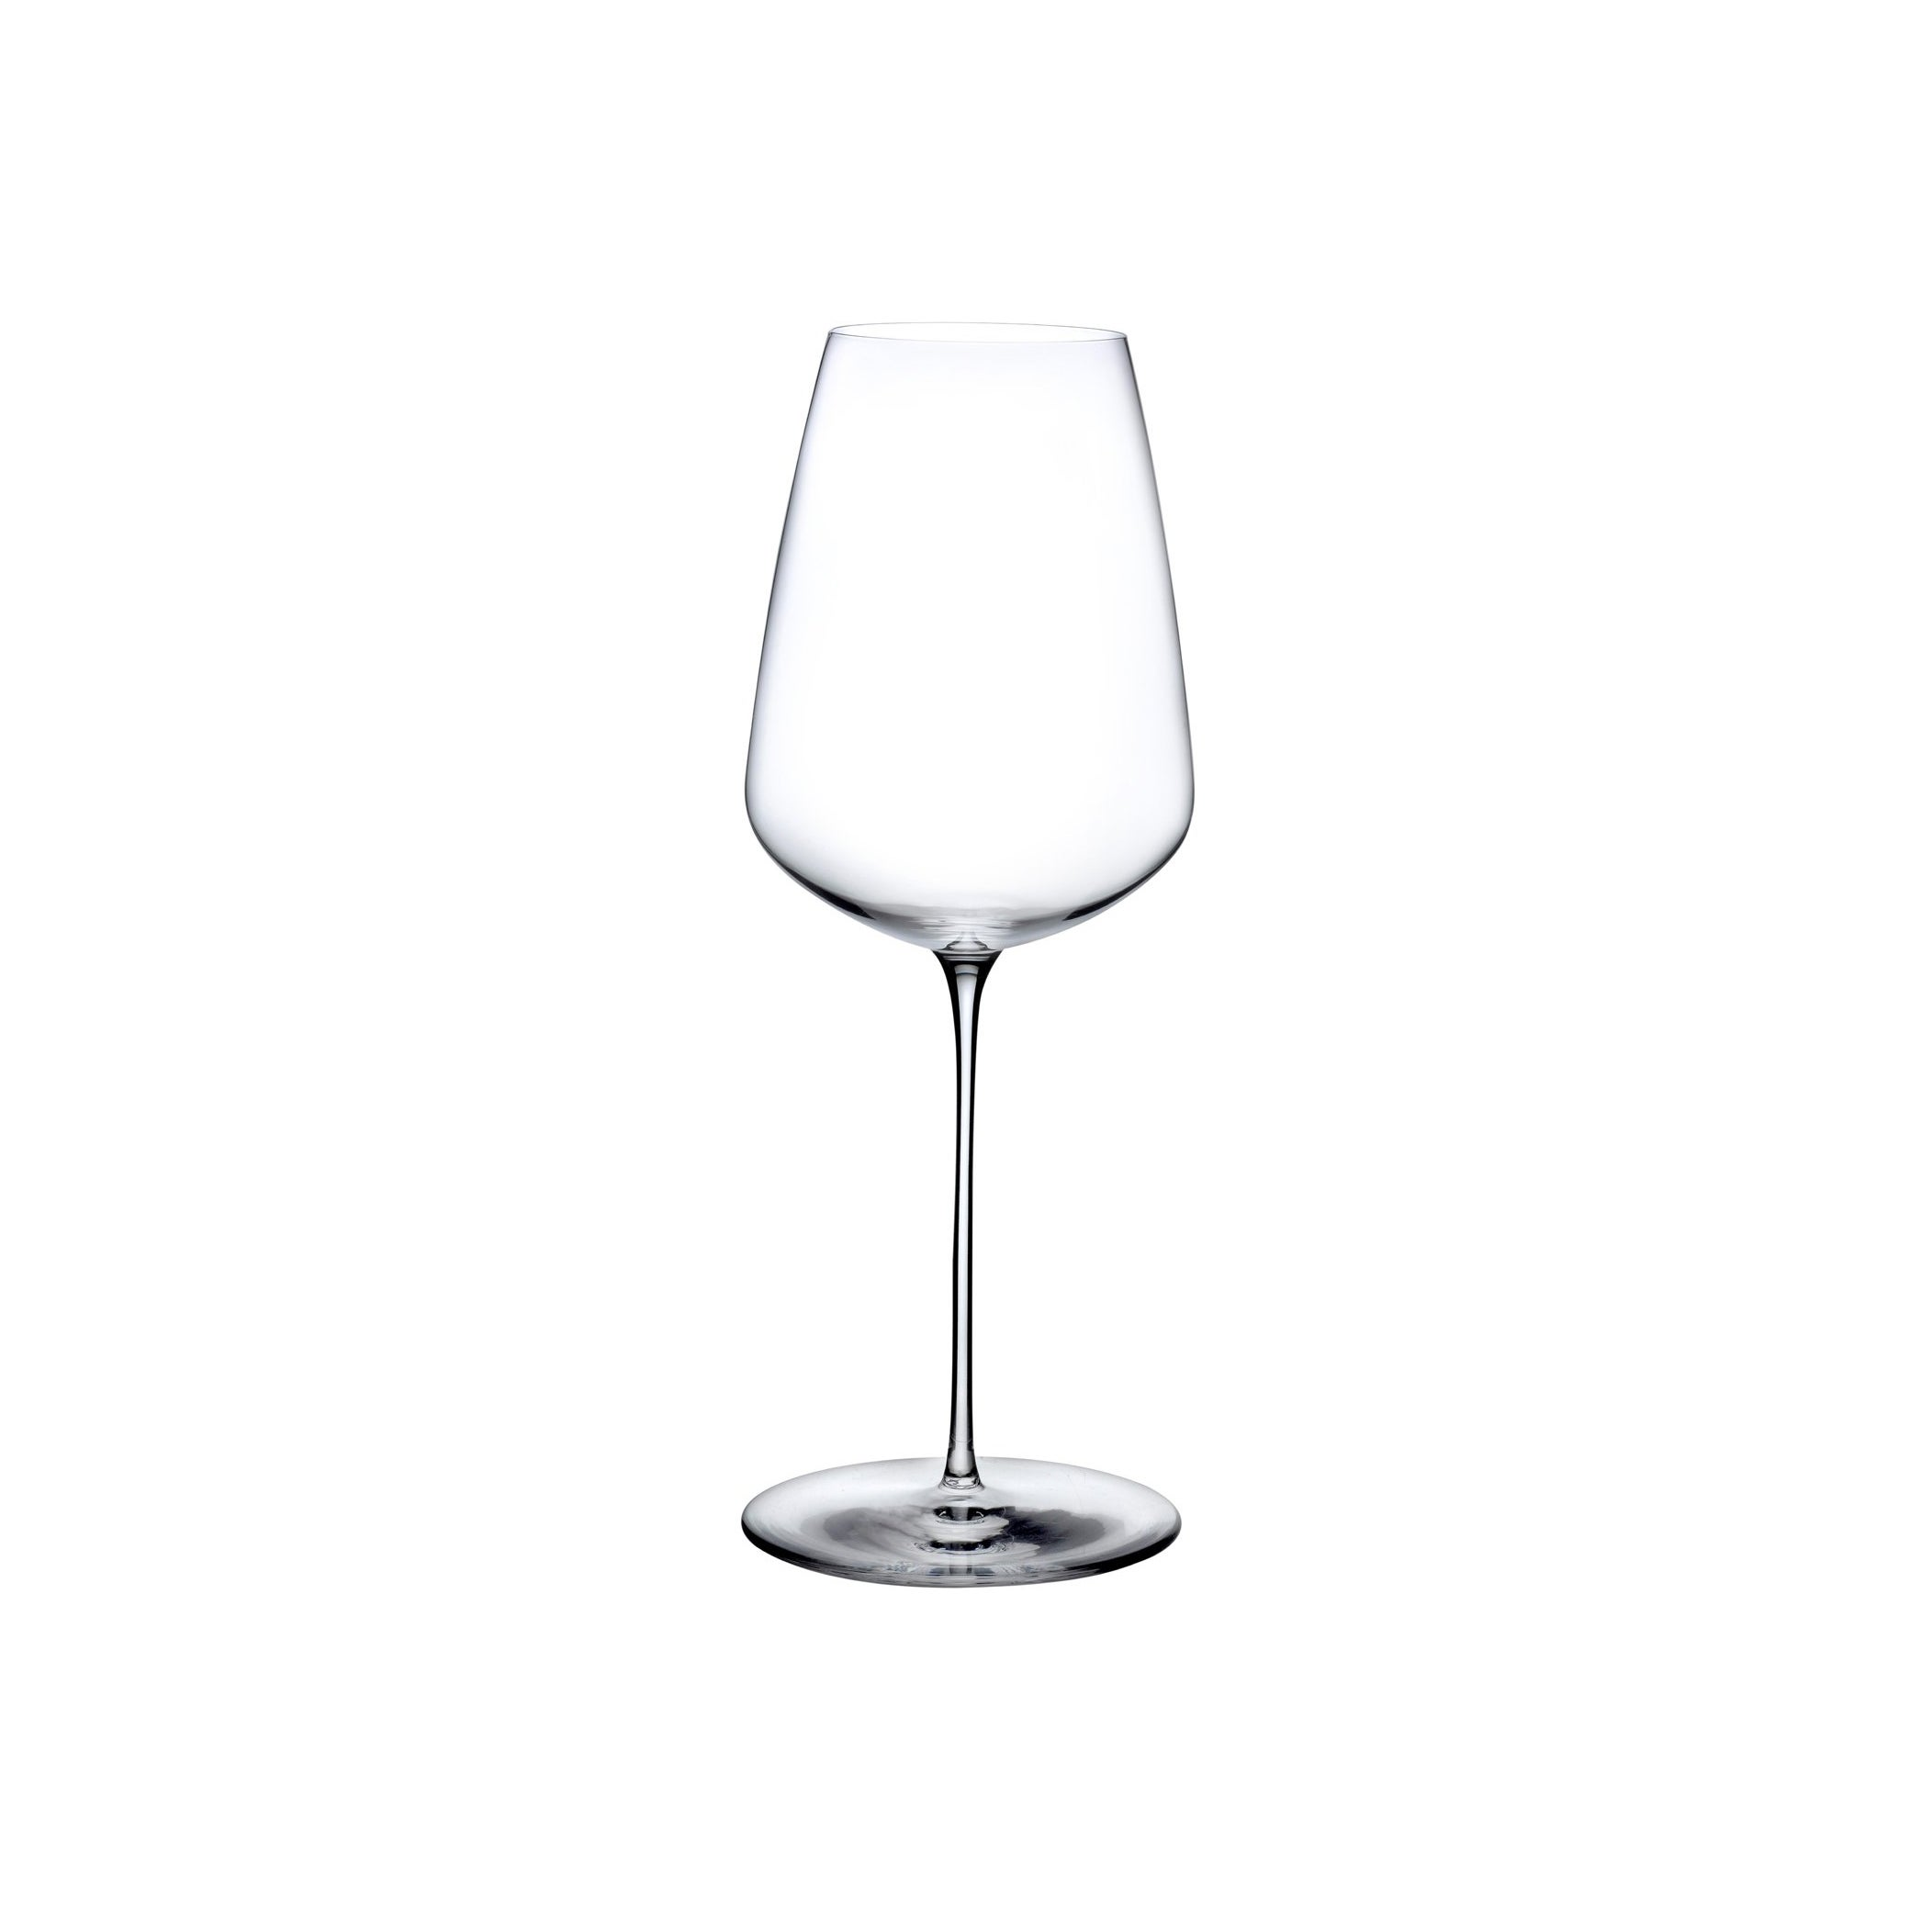 Best Best Champagne Glasses Option: NUDE Stem Zero Delicate White Wine Glass